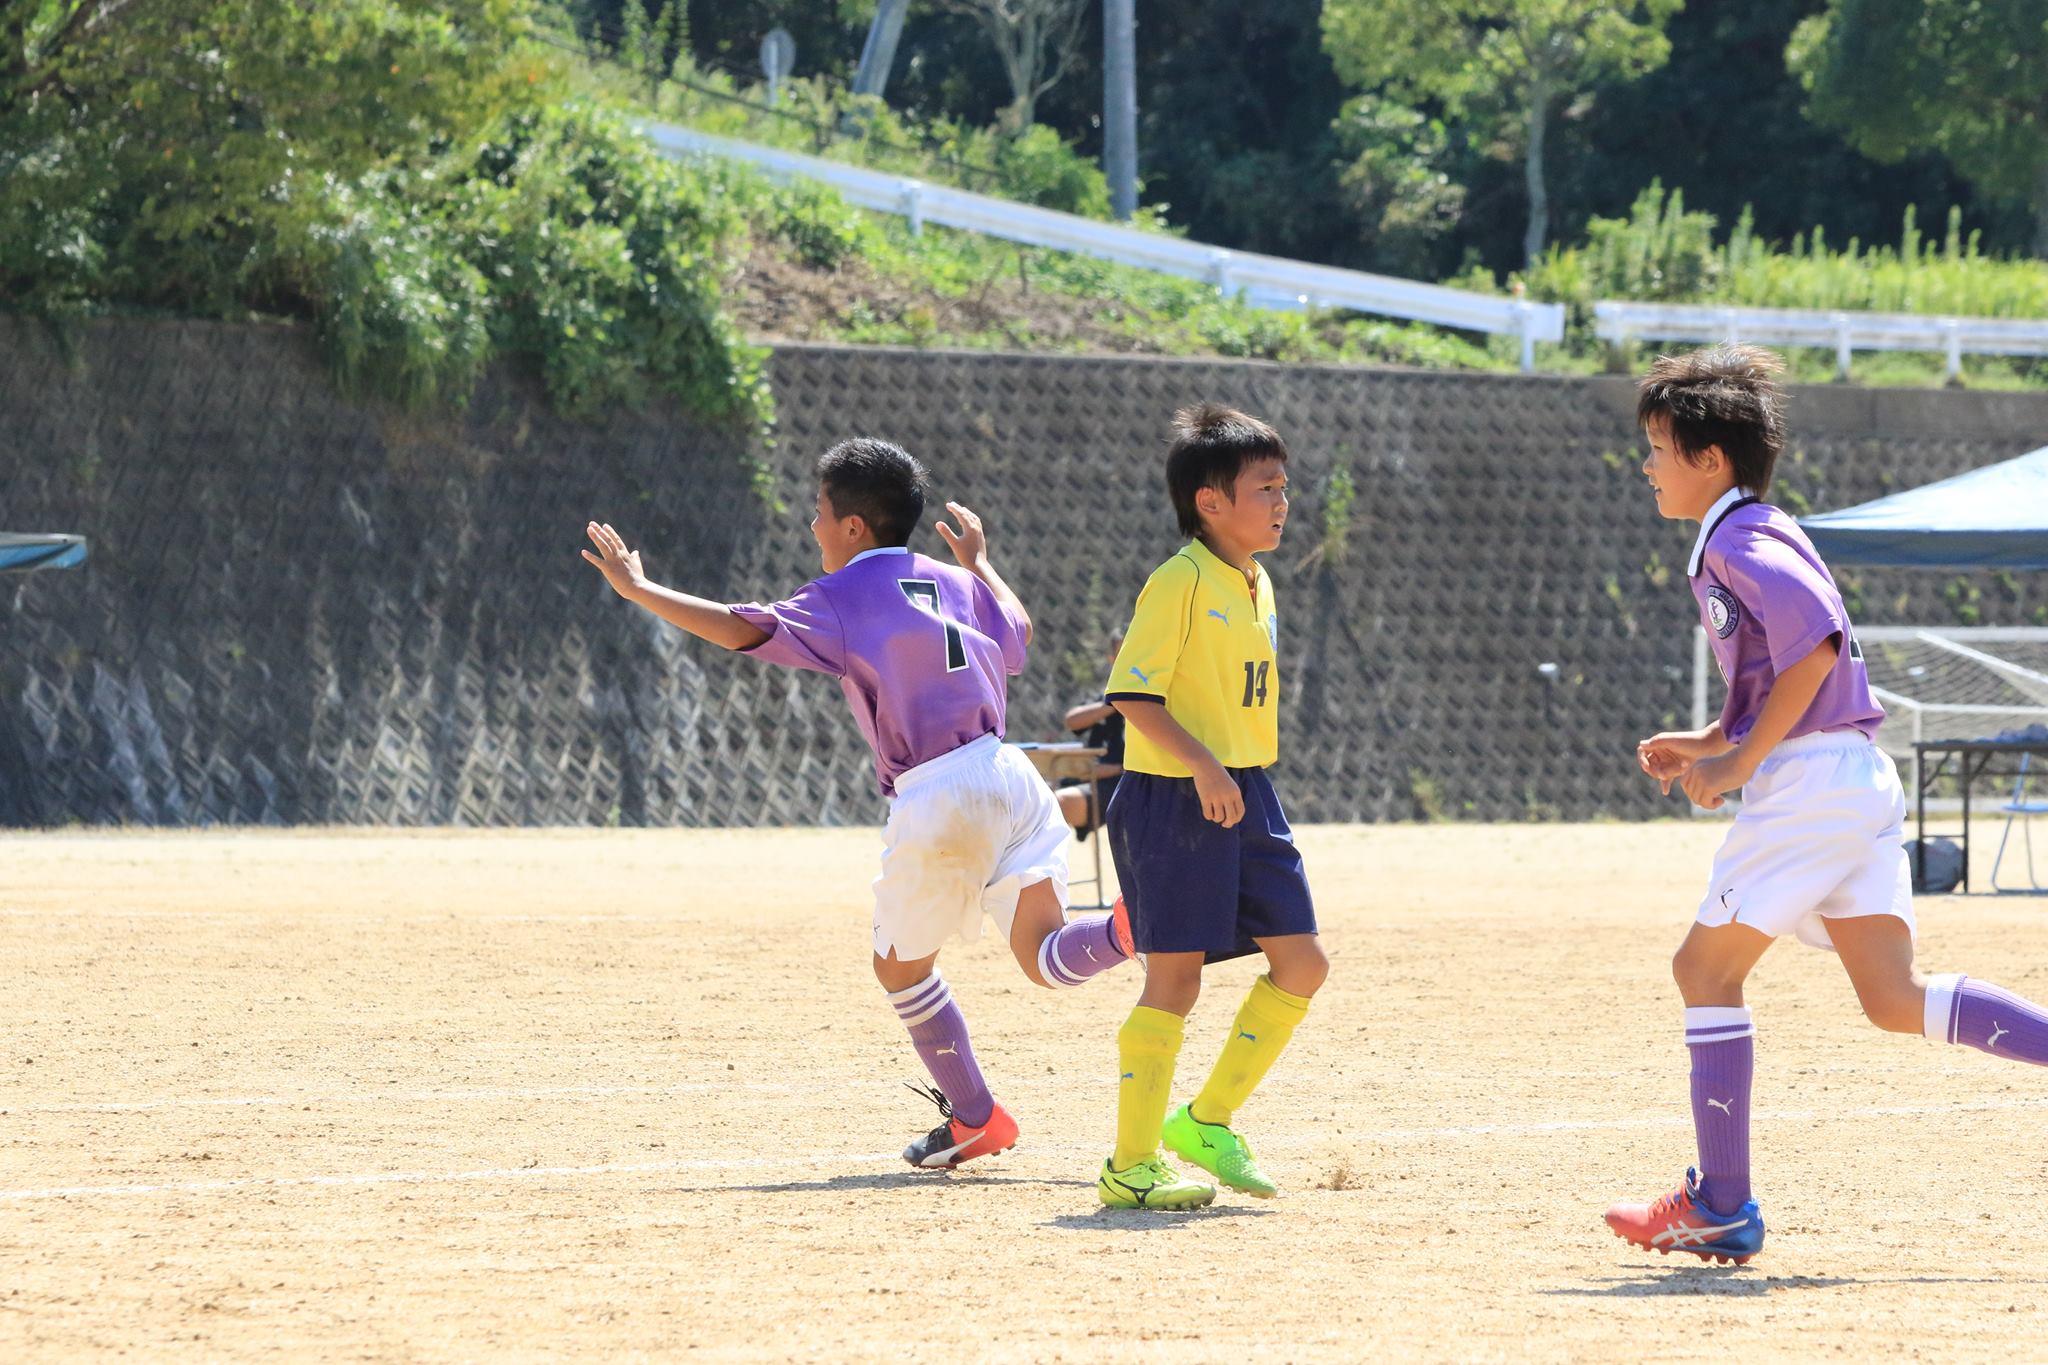 2016U10しんきんカップ中西部予選vs島田第一ゴールシーン09.jpg